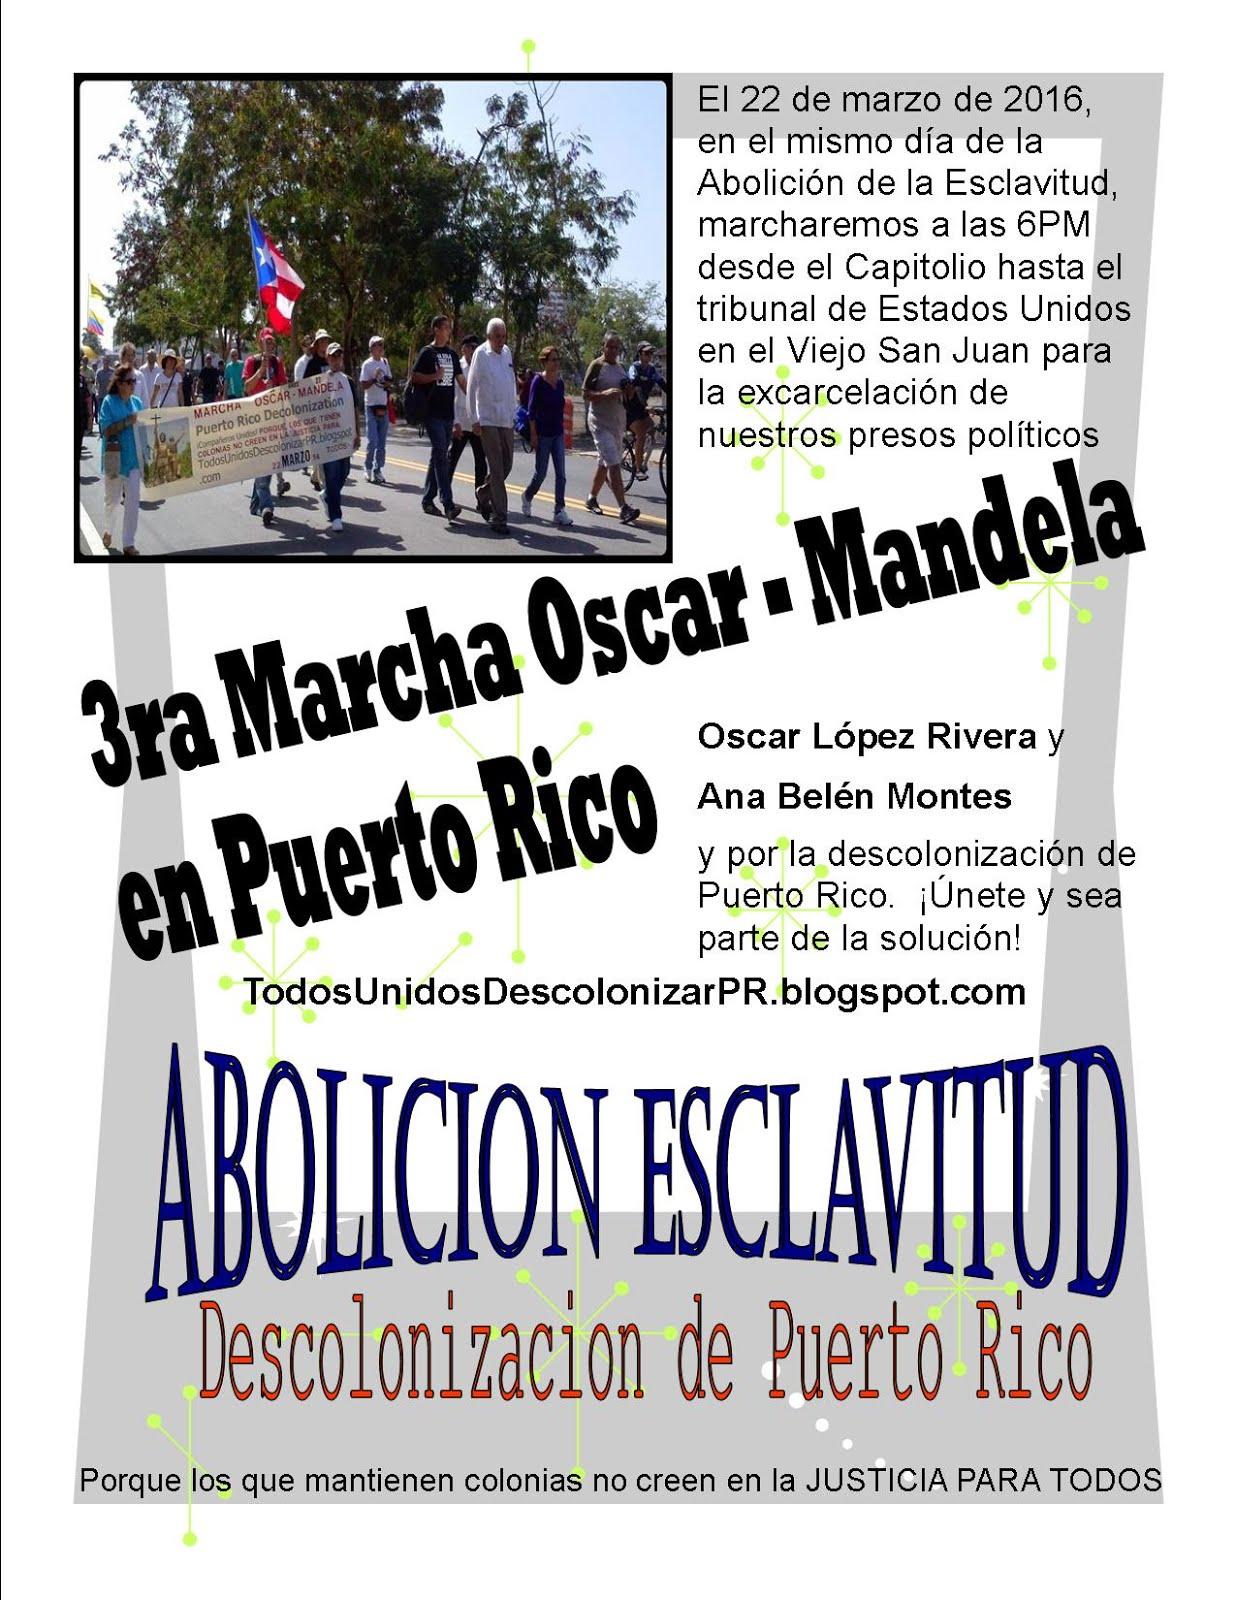 3ra Marcha Oscar - Mandela en Puerto Rico 2016